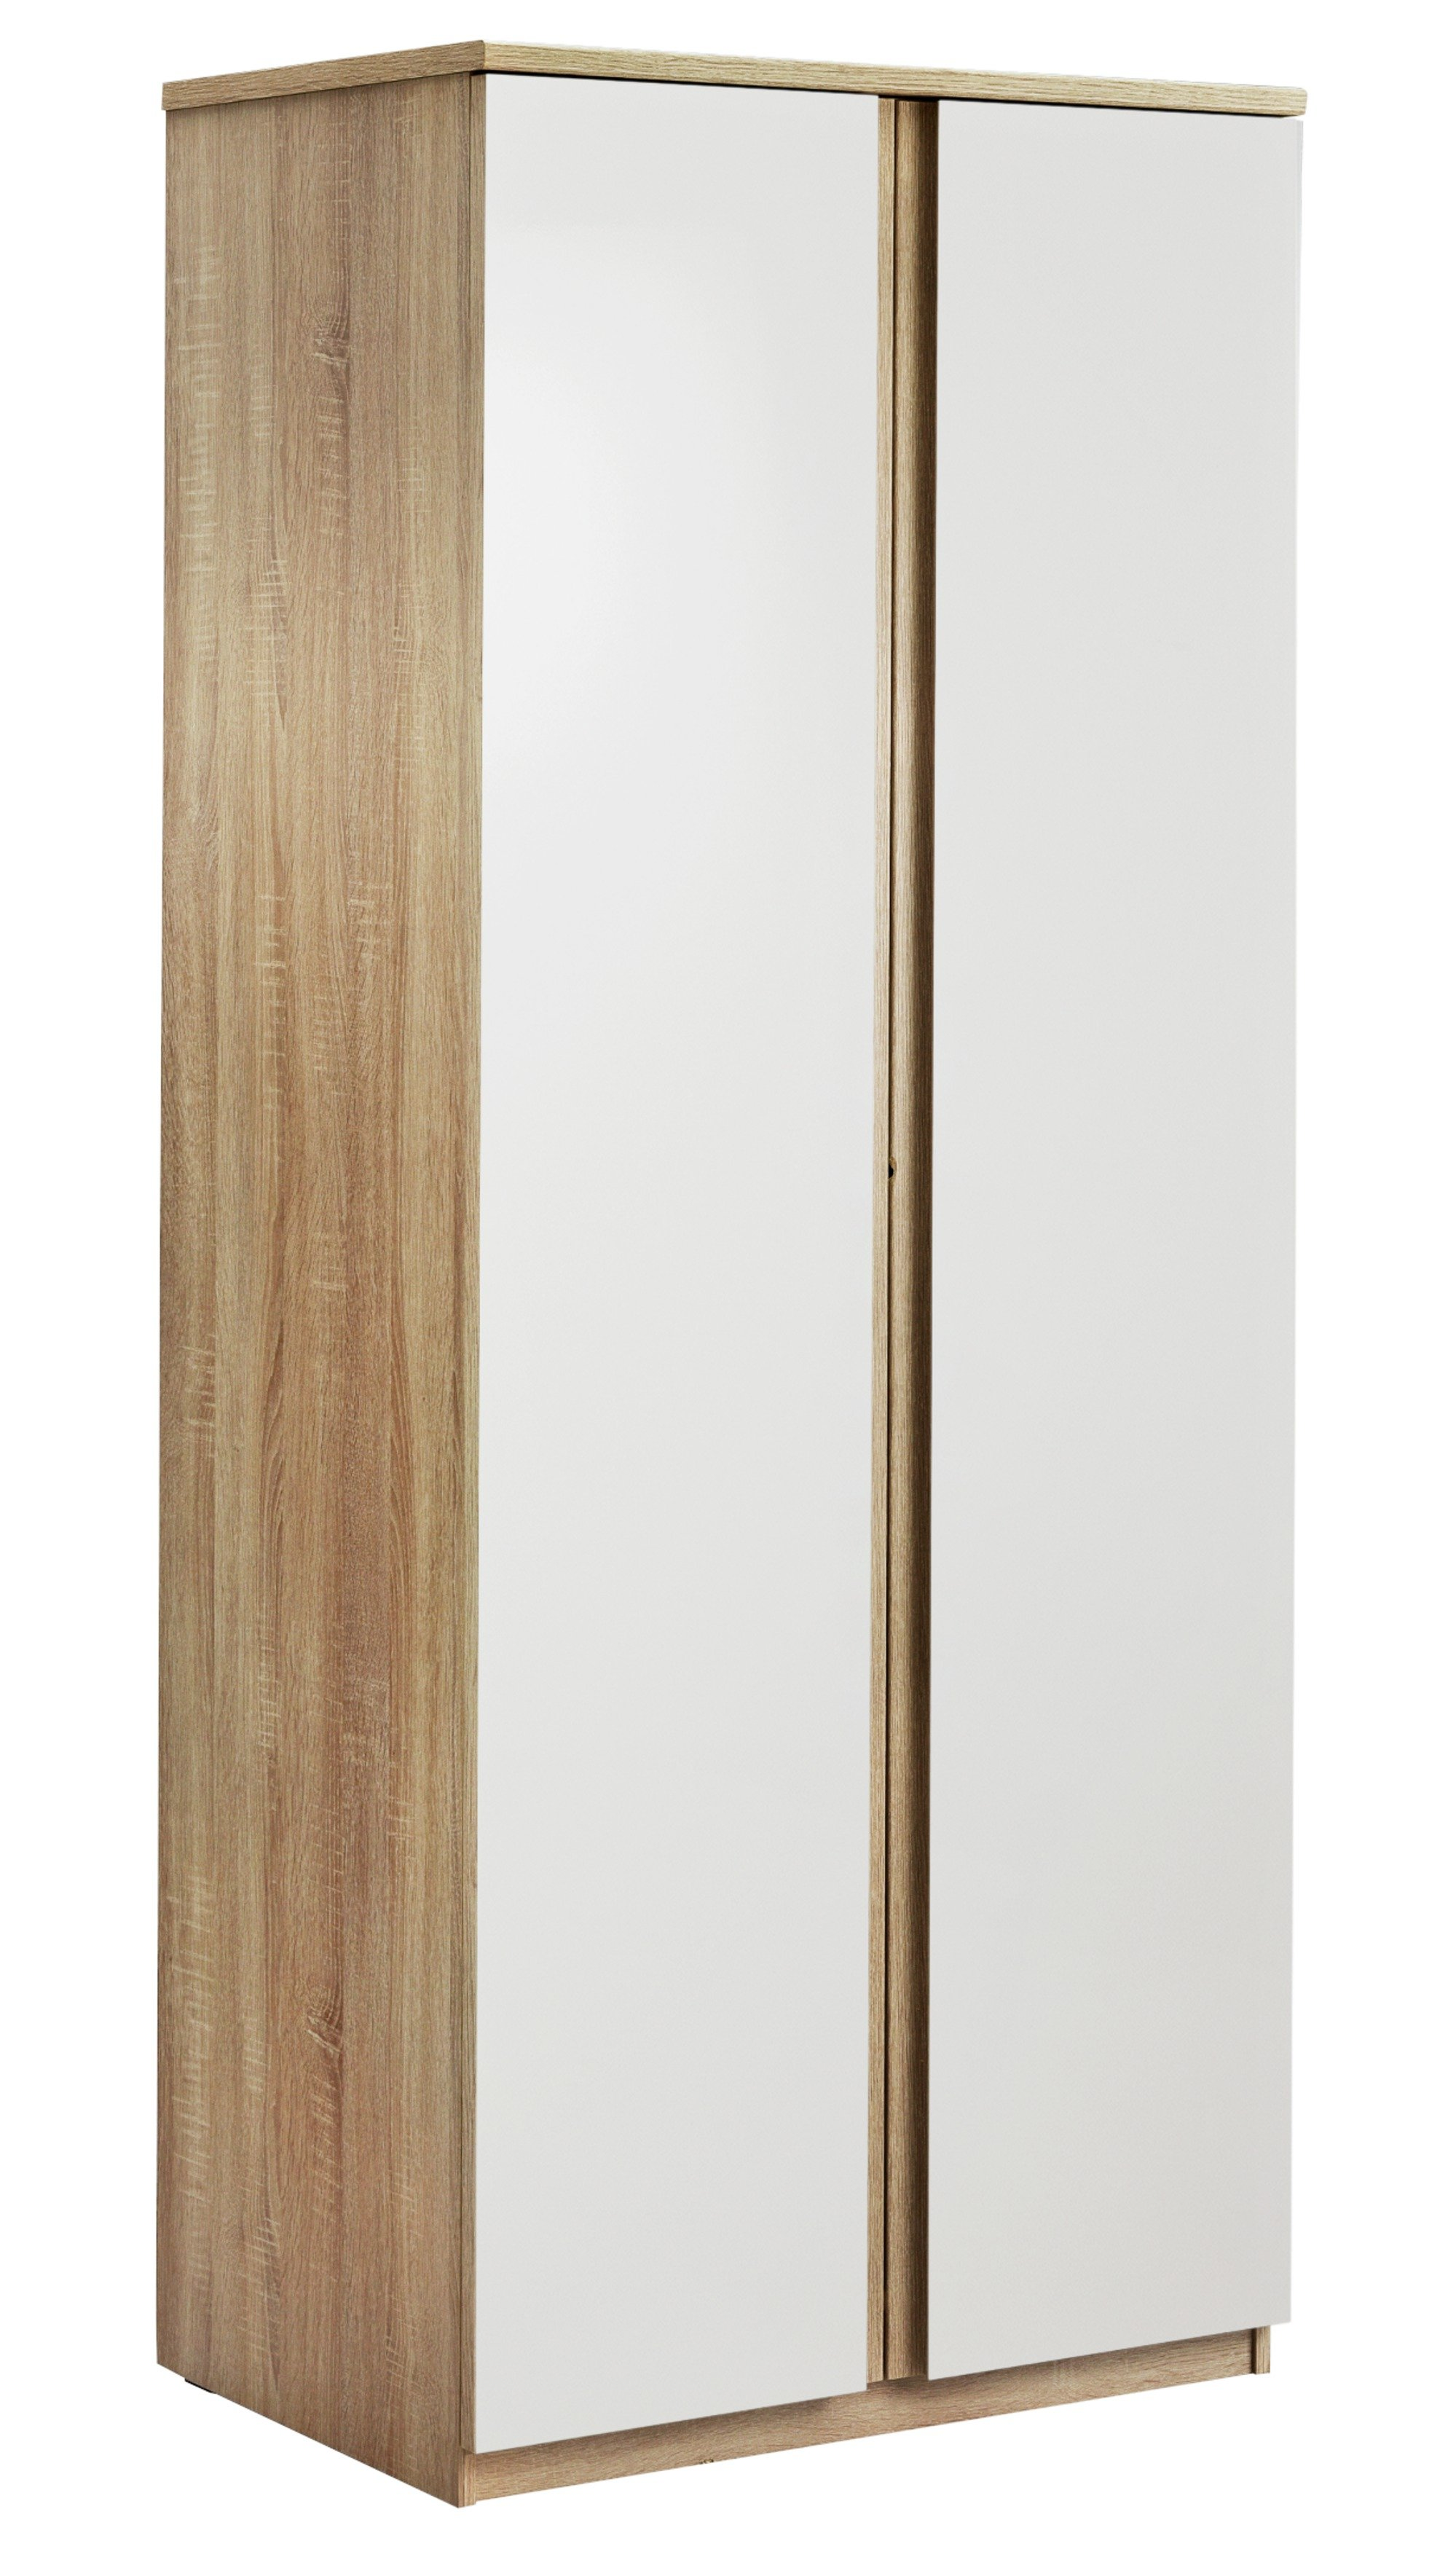 Image of Avenue 2 Door Wardrobe - Natural Oak Effect & White Gloss